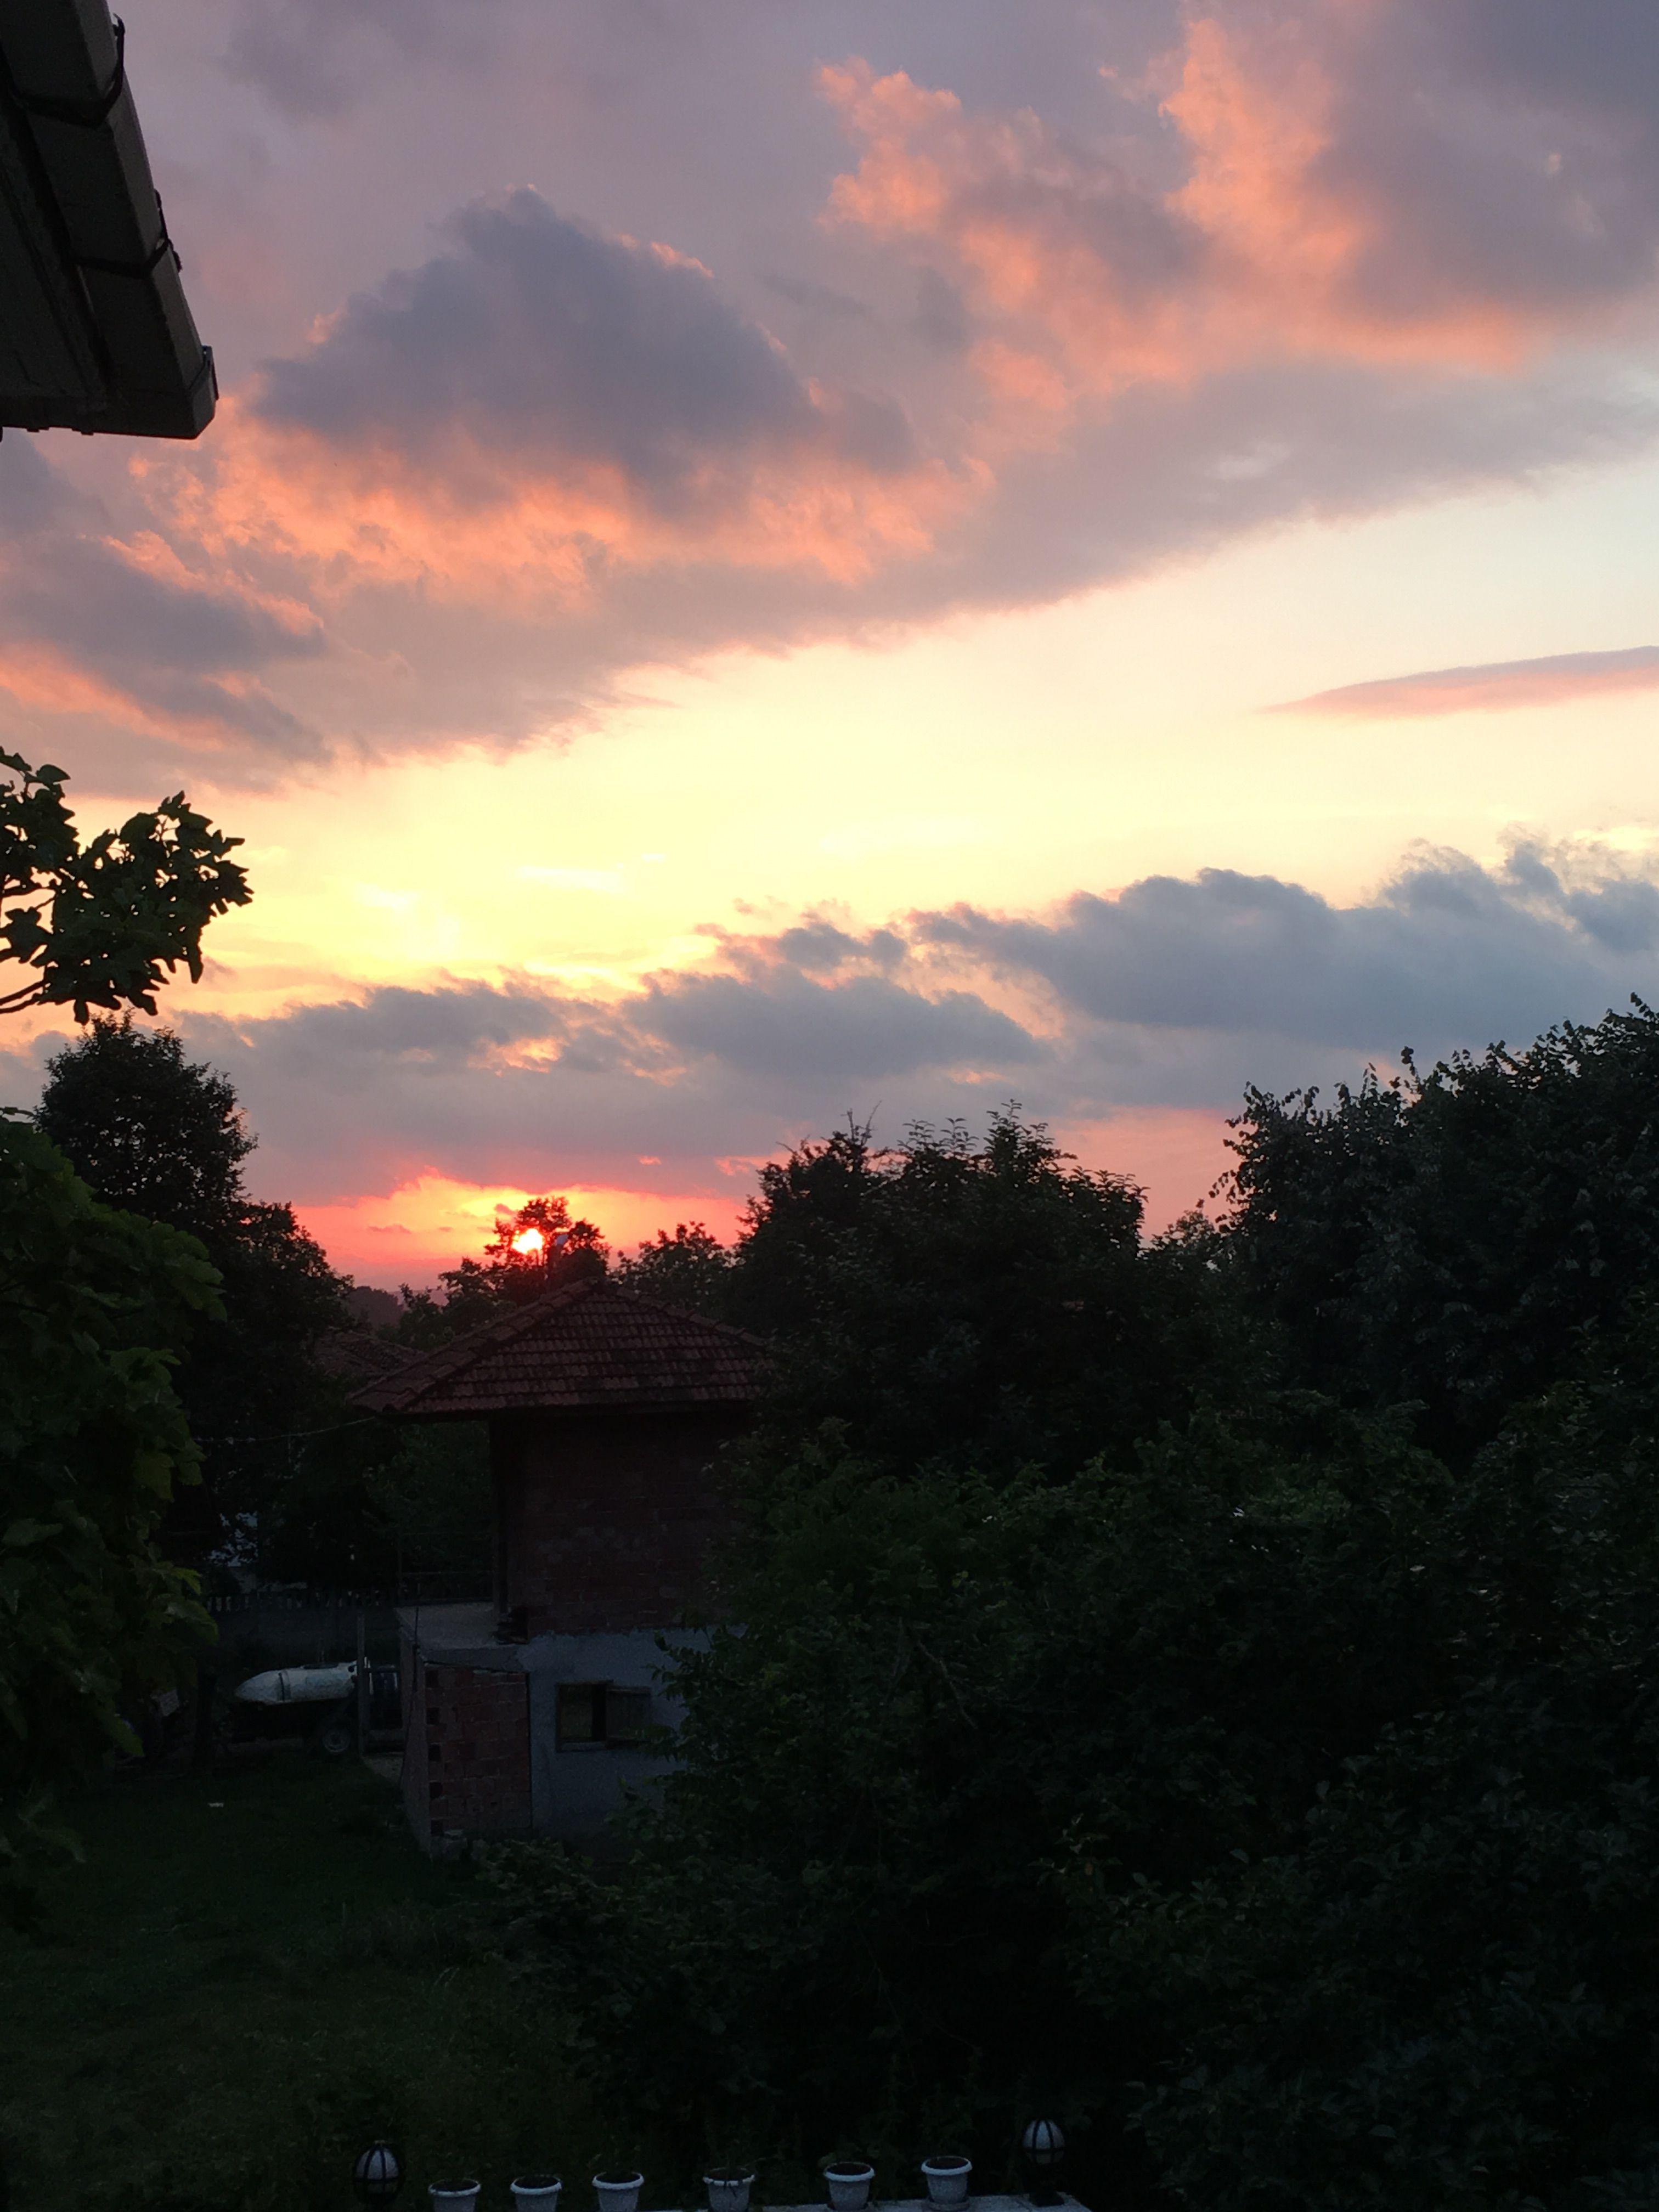 Sunset Trees Sun View Sky Clouds Nofilter Zbk Photo